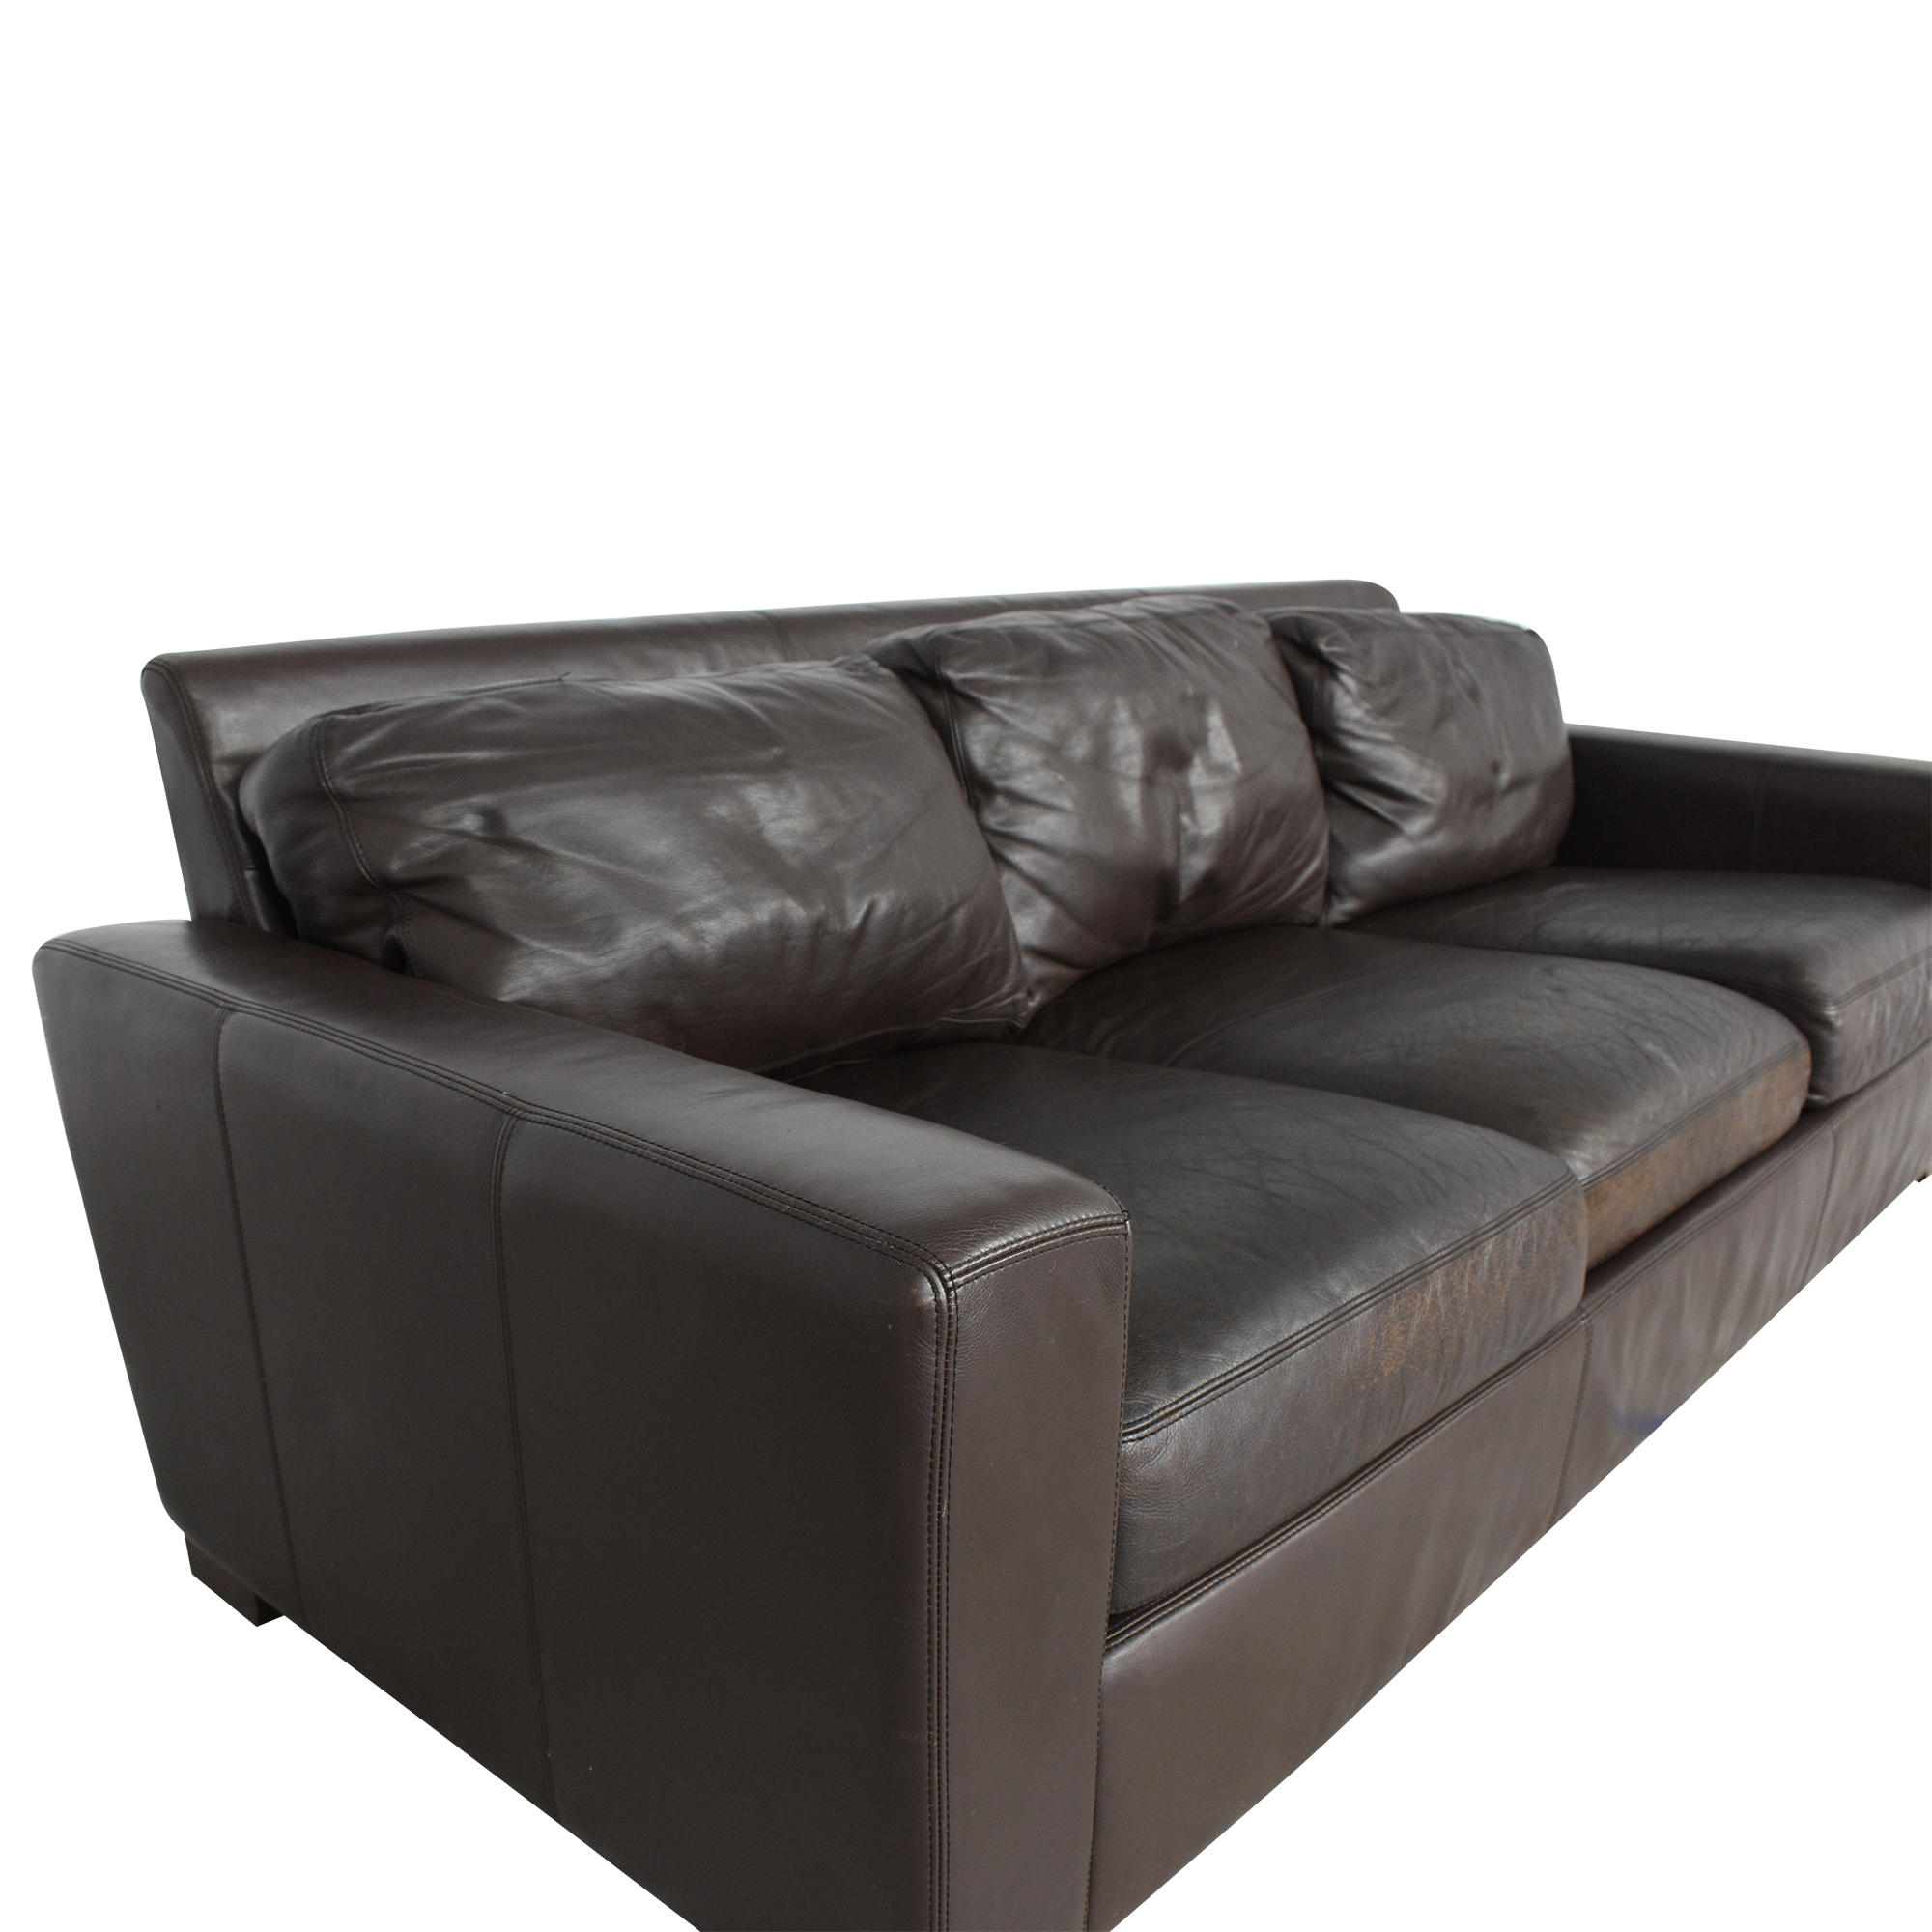 shop Design Within Reach Design Within Reach Portola Three Cushion Sofa online